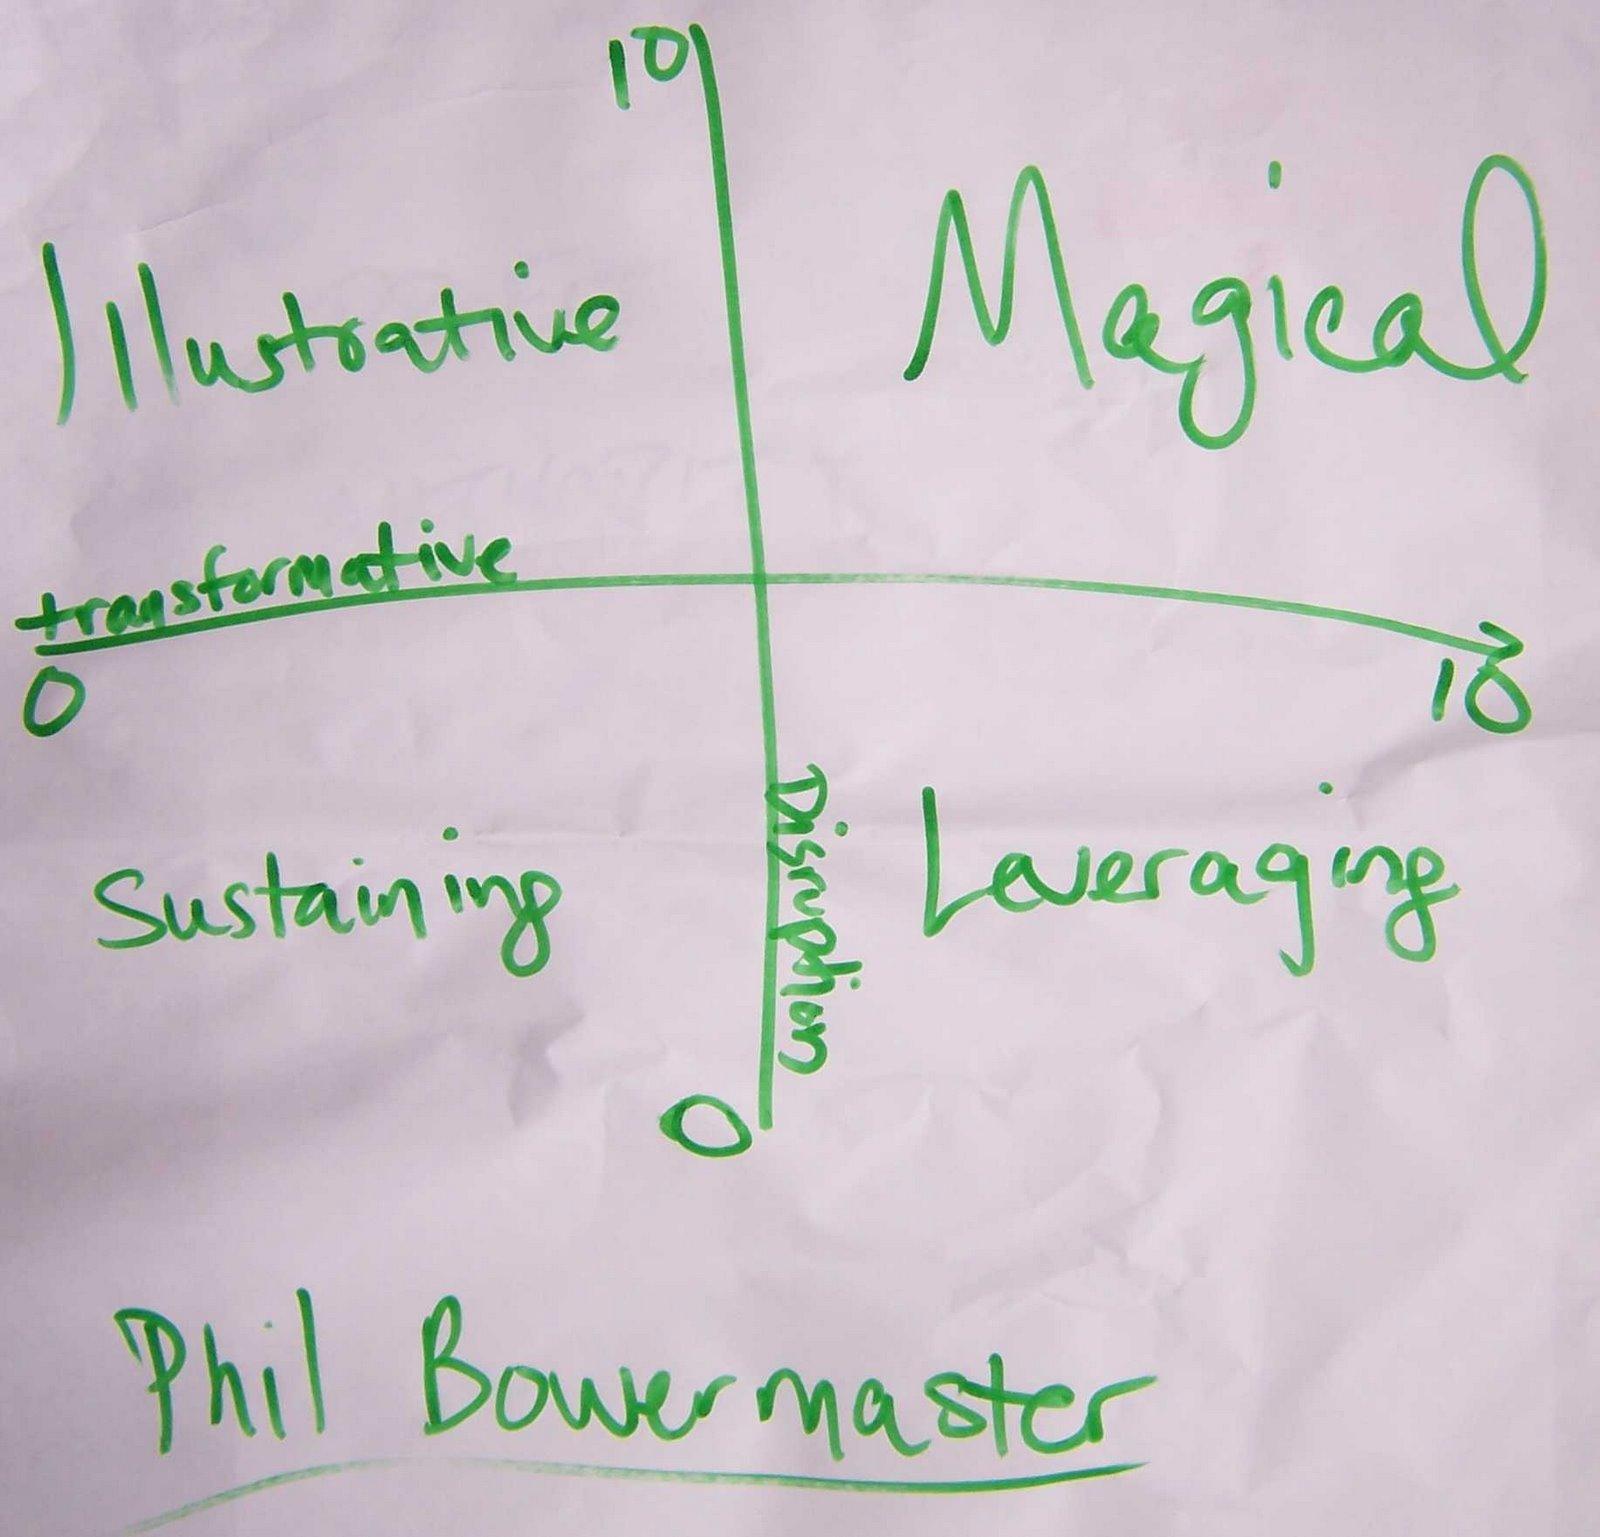 [Disruptive+and+transformative+dimensions.jpg]